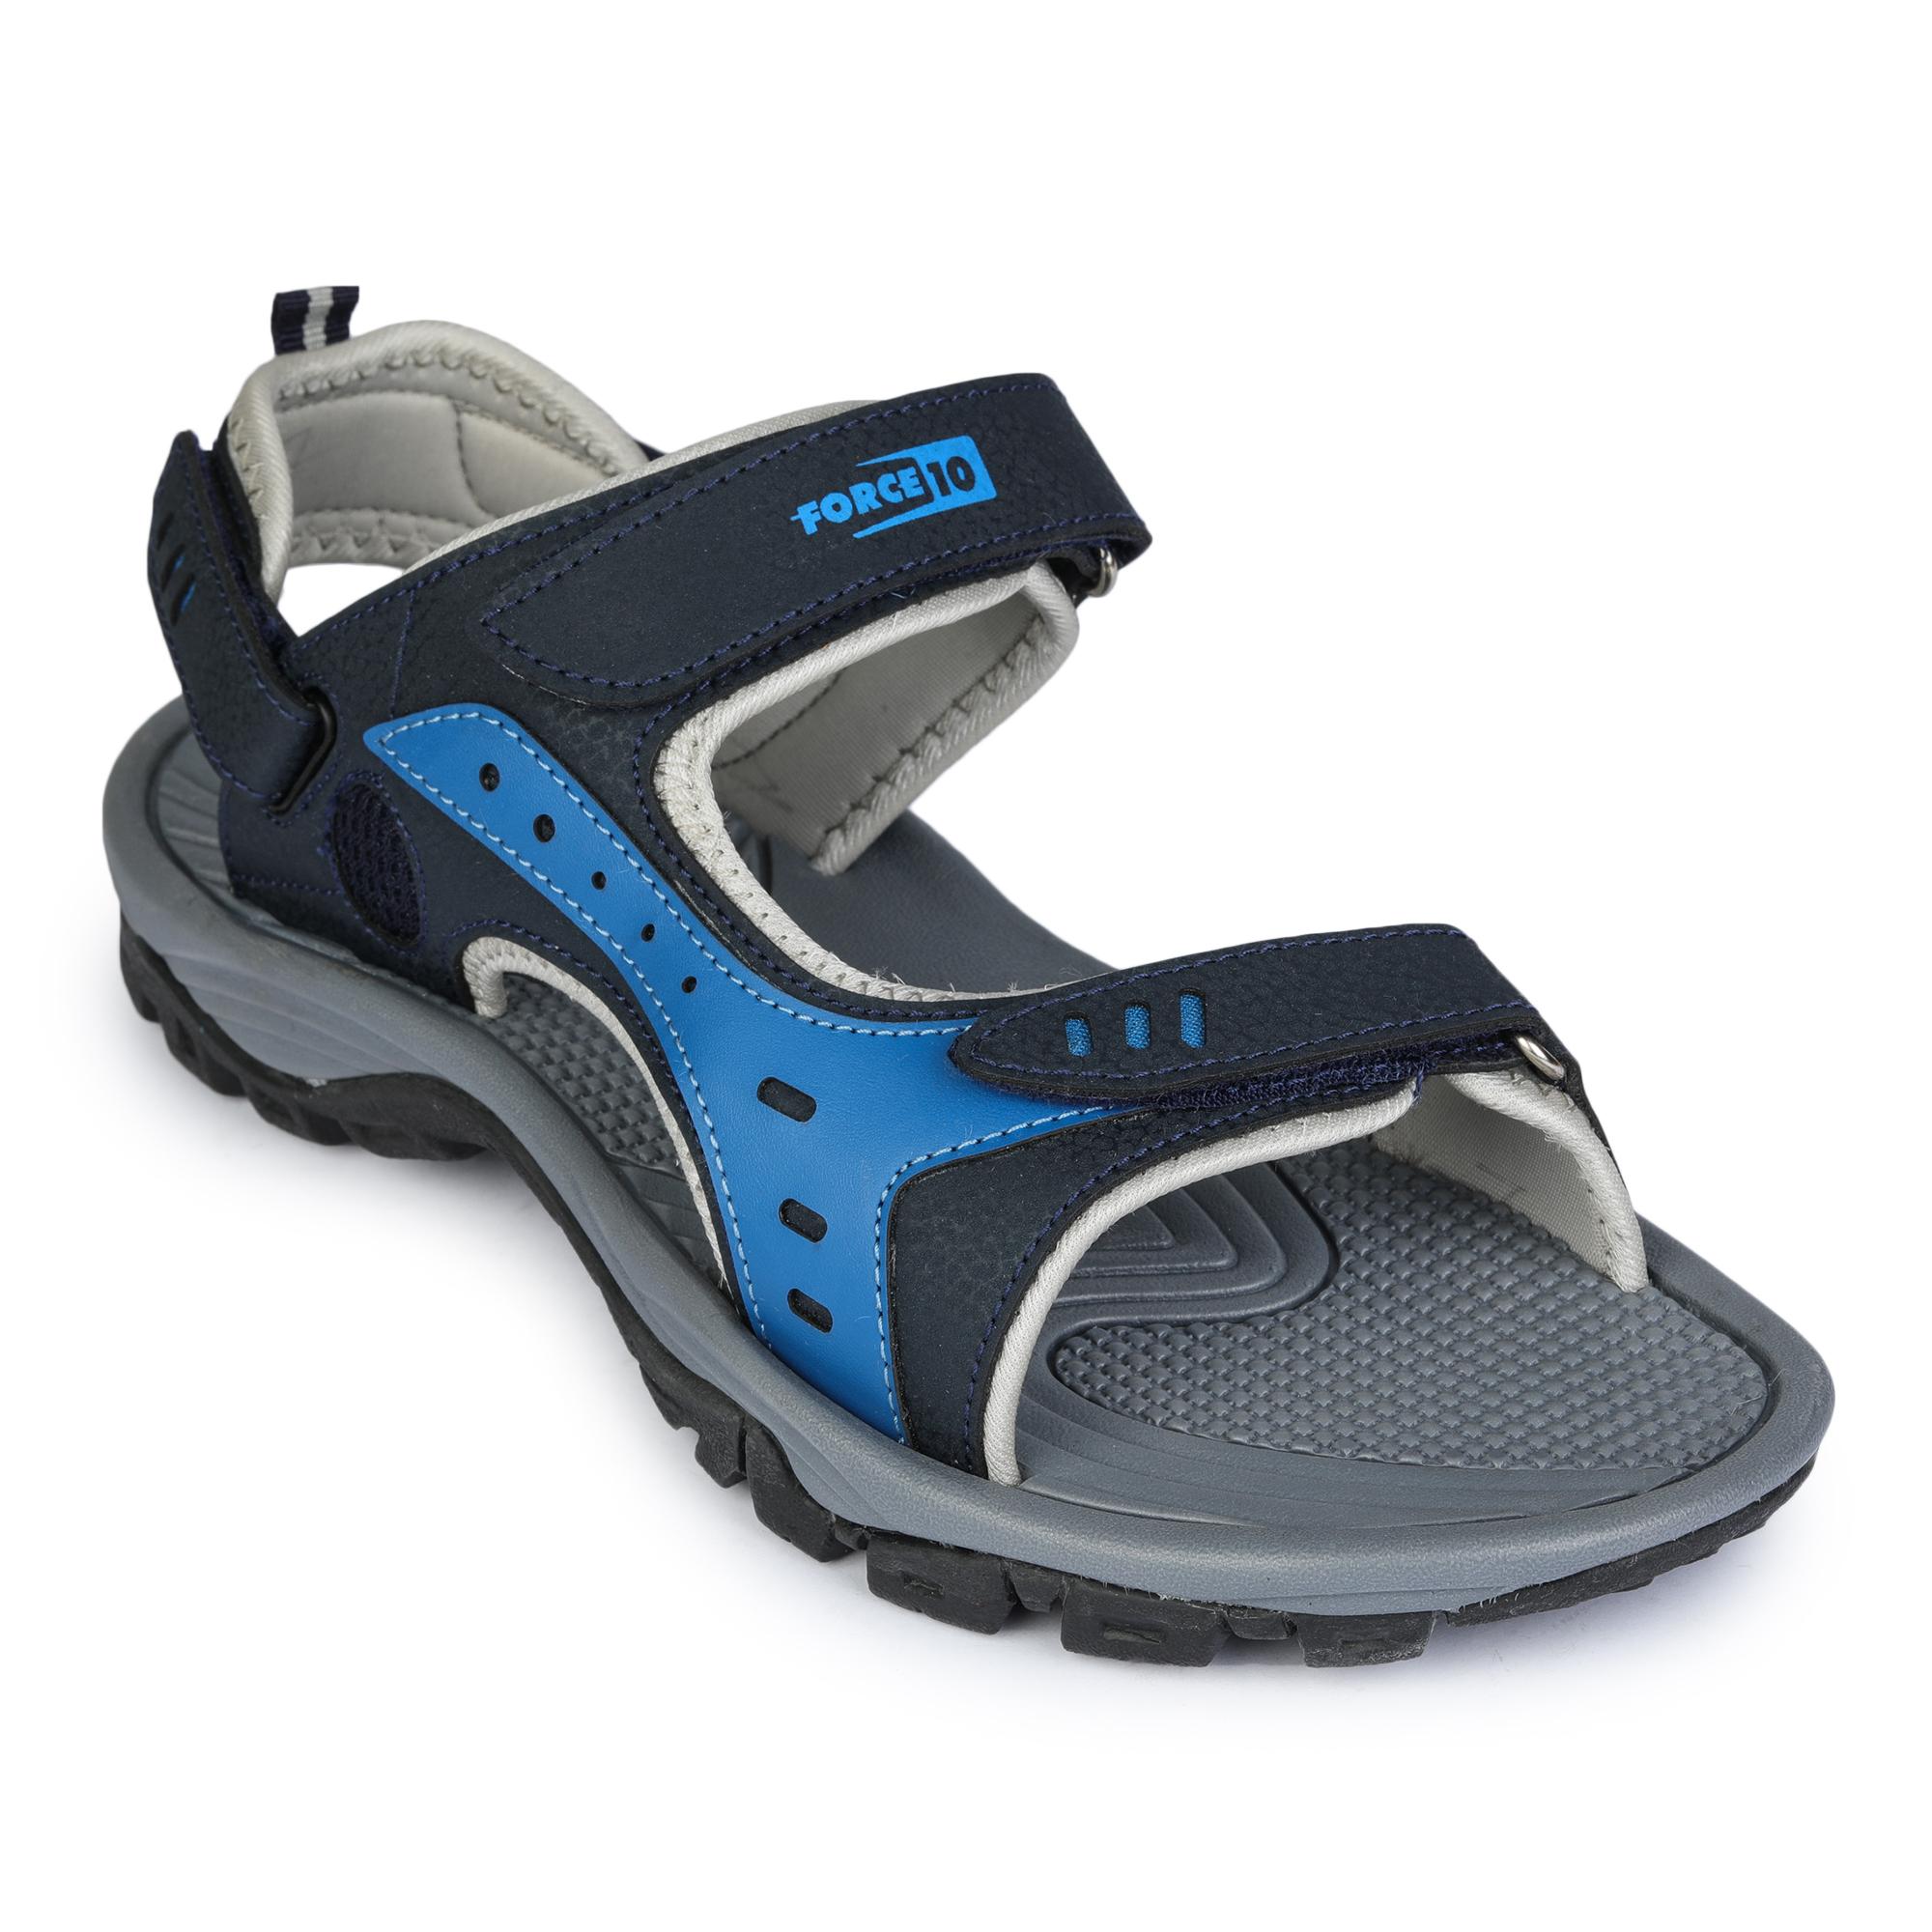 Liberty | Liberty Force 10 Blue Sports Sandals DEMON-1E_Blue For - Men